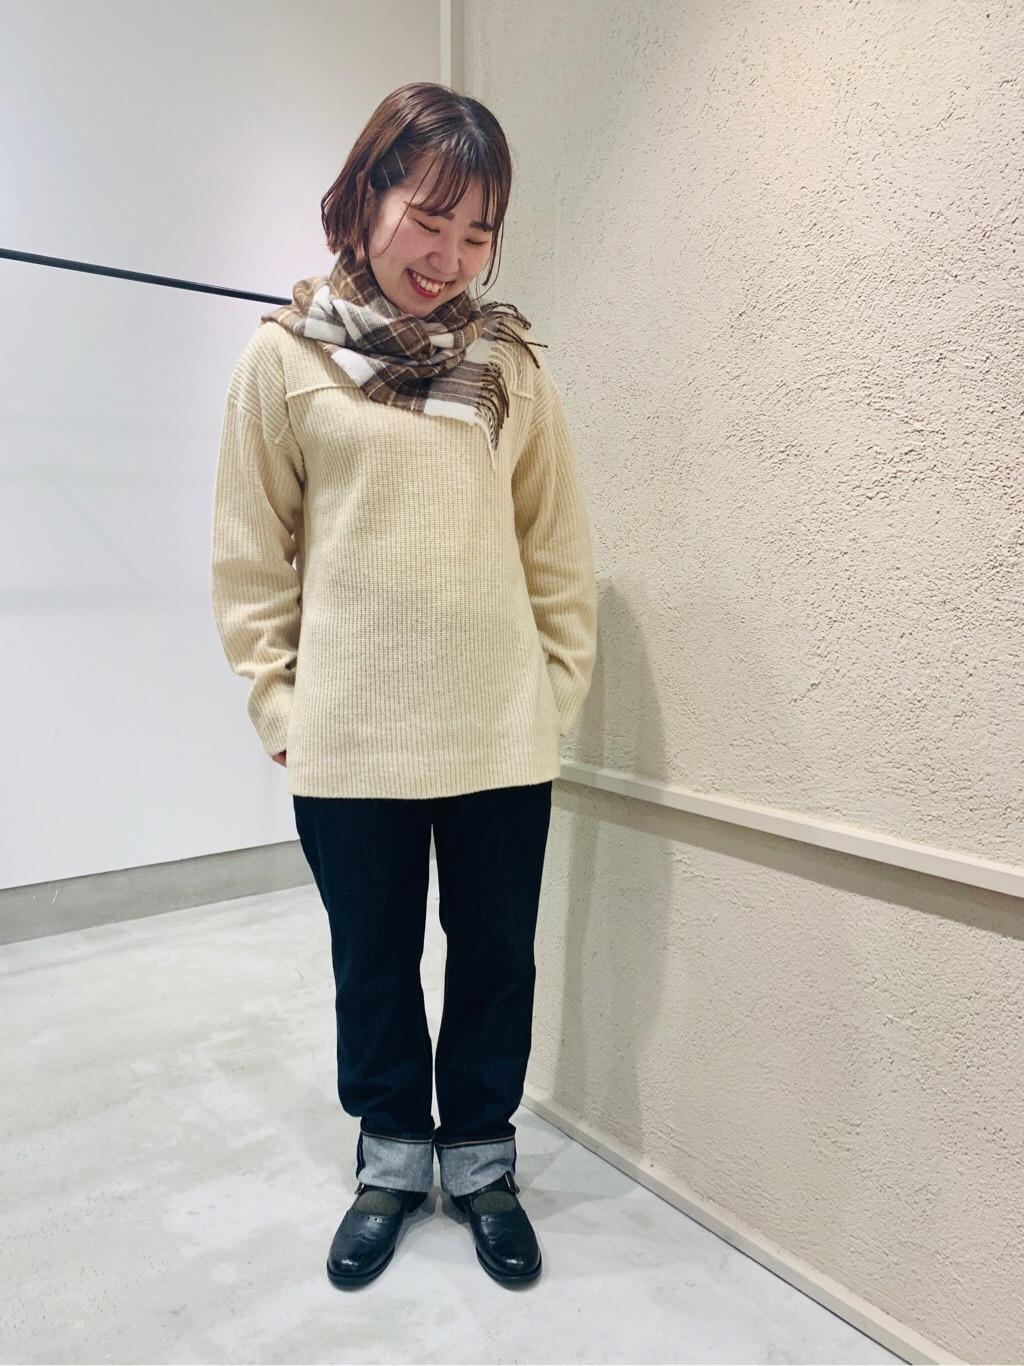 chambre de charme 横浜ジョイナス 身長:155cm 2020.10.15